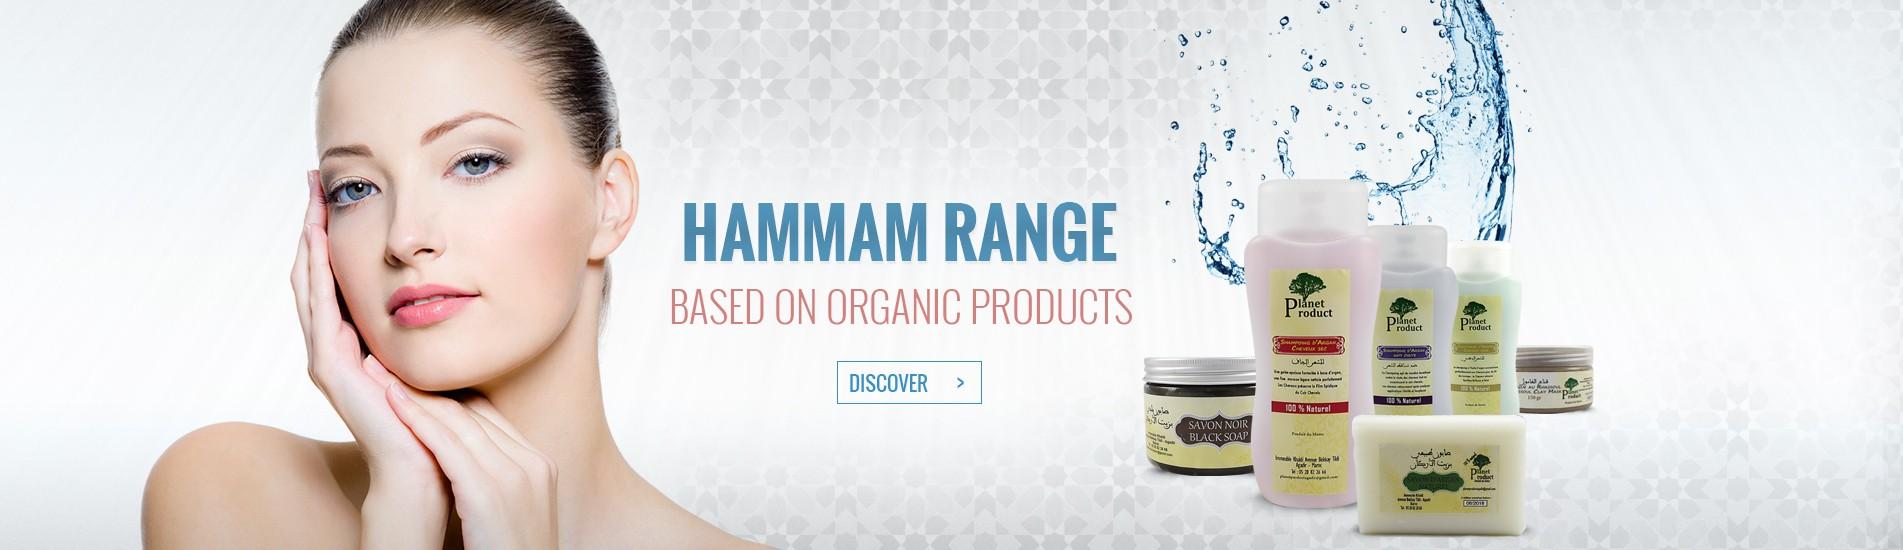 HAMMAM RANGE